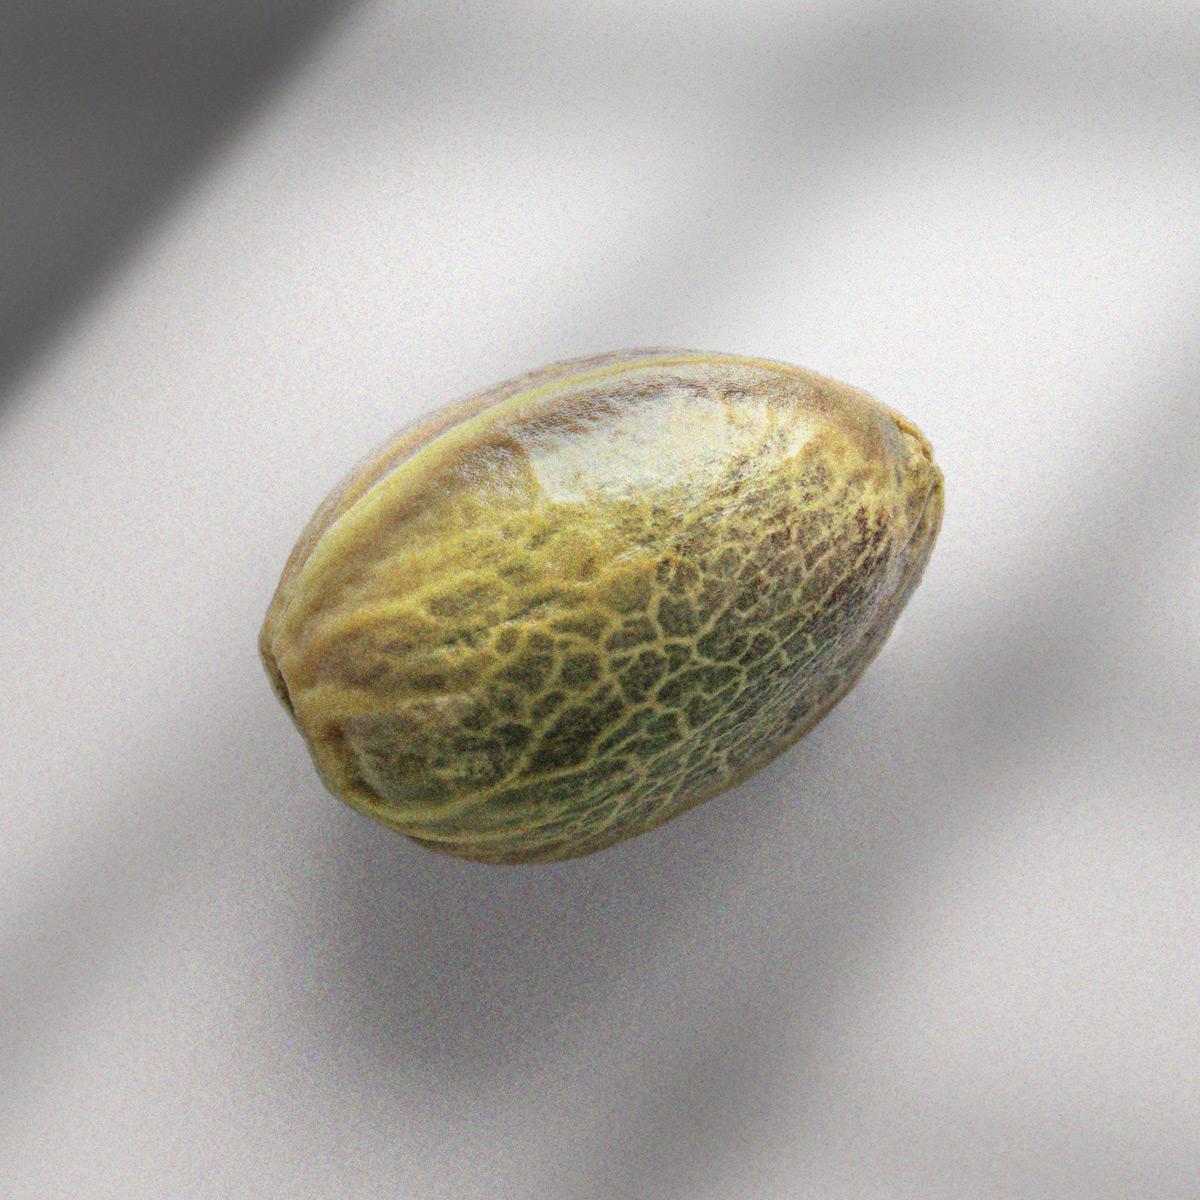 Cannabis Seed Macro